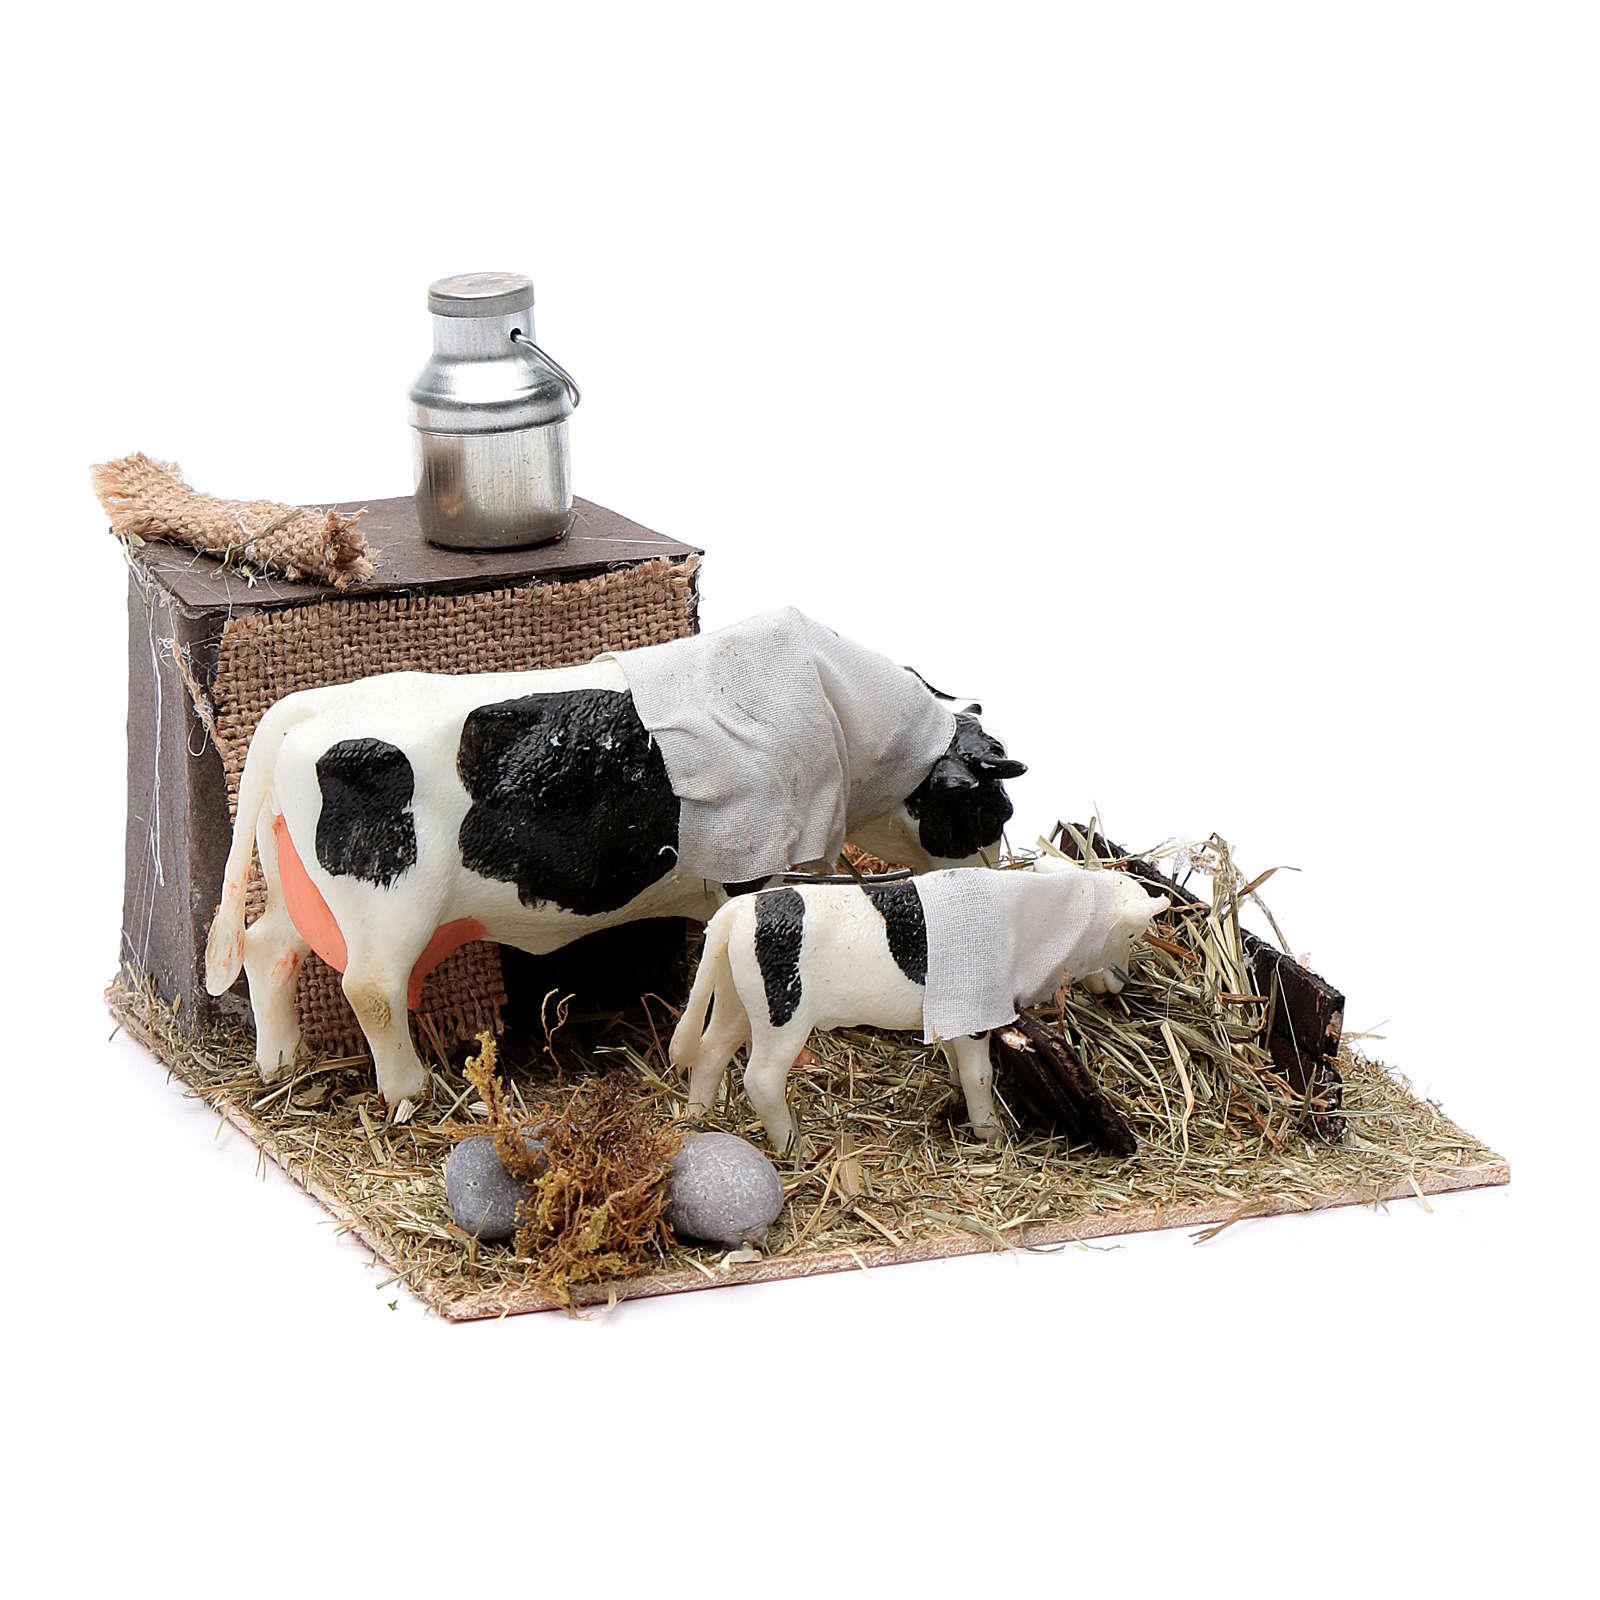 Neapolitan nativity scene cow and calf with trough in movement 12 cm 4